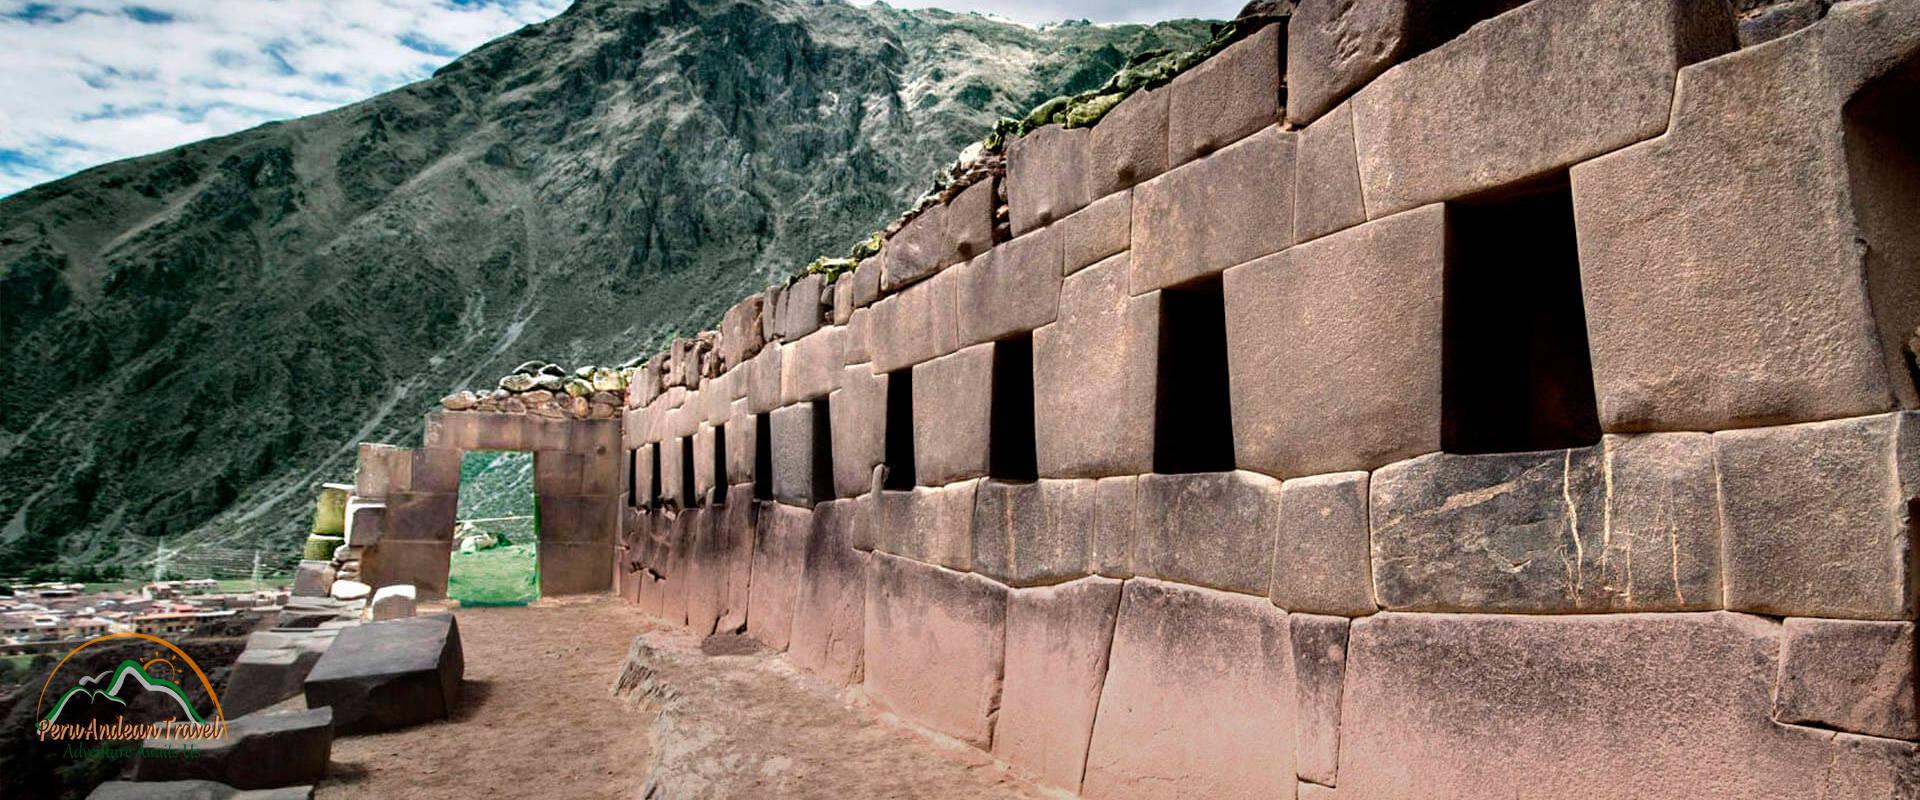 Ollantaytambo - Sacred Valley Tour